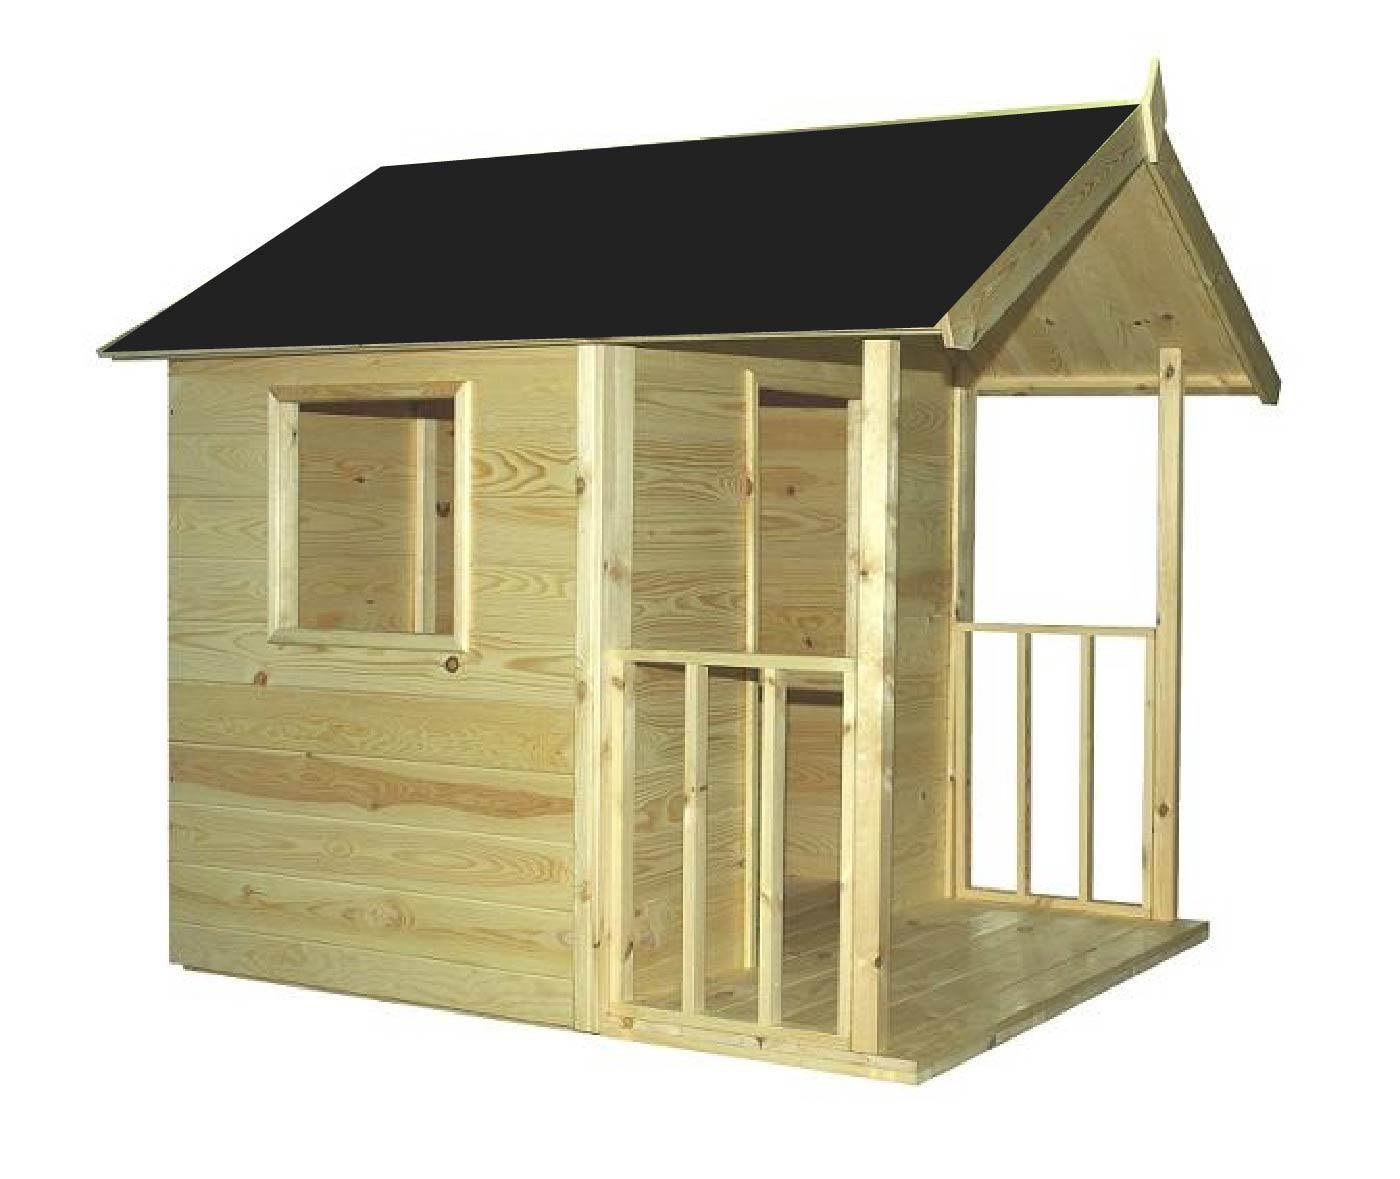 gartenh uschen f r kinder gartenh uschen f r kinder holz kinderspielhaus cory 1 2 x 1 8m. Black Bedroom Furniture Sets. Home Design Ideas